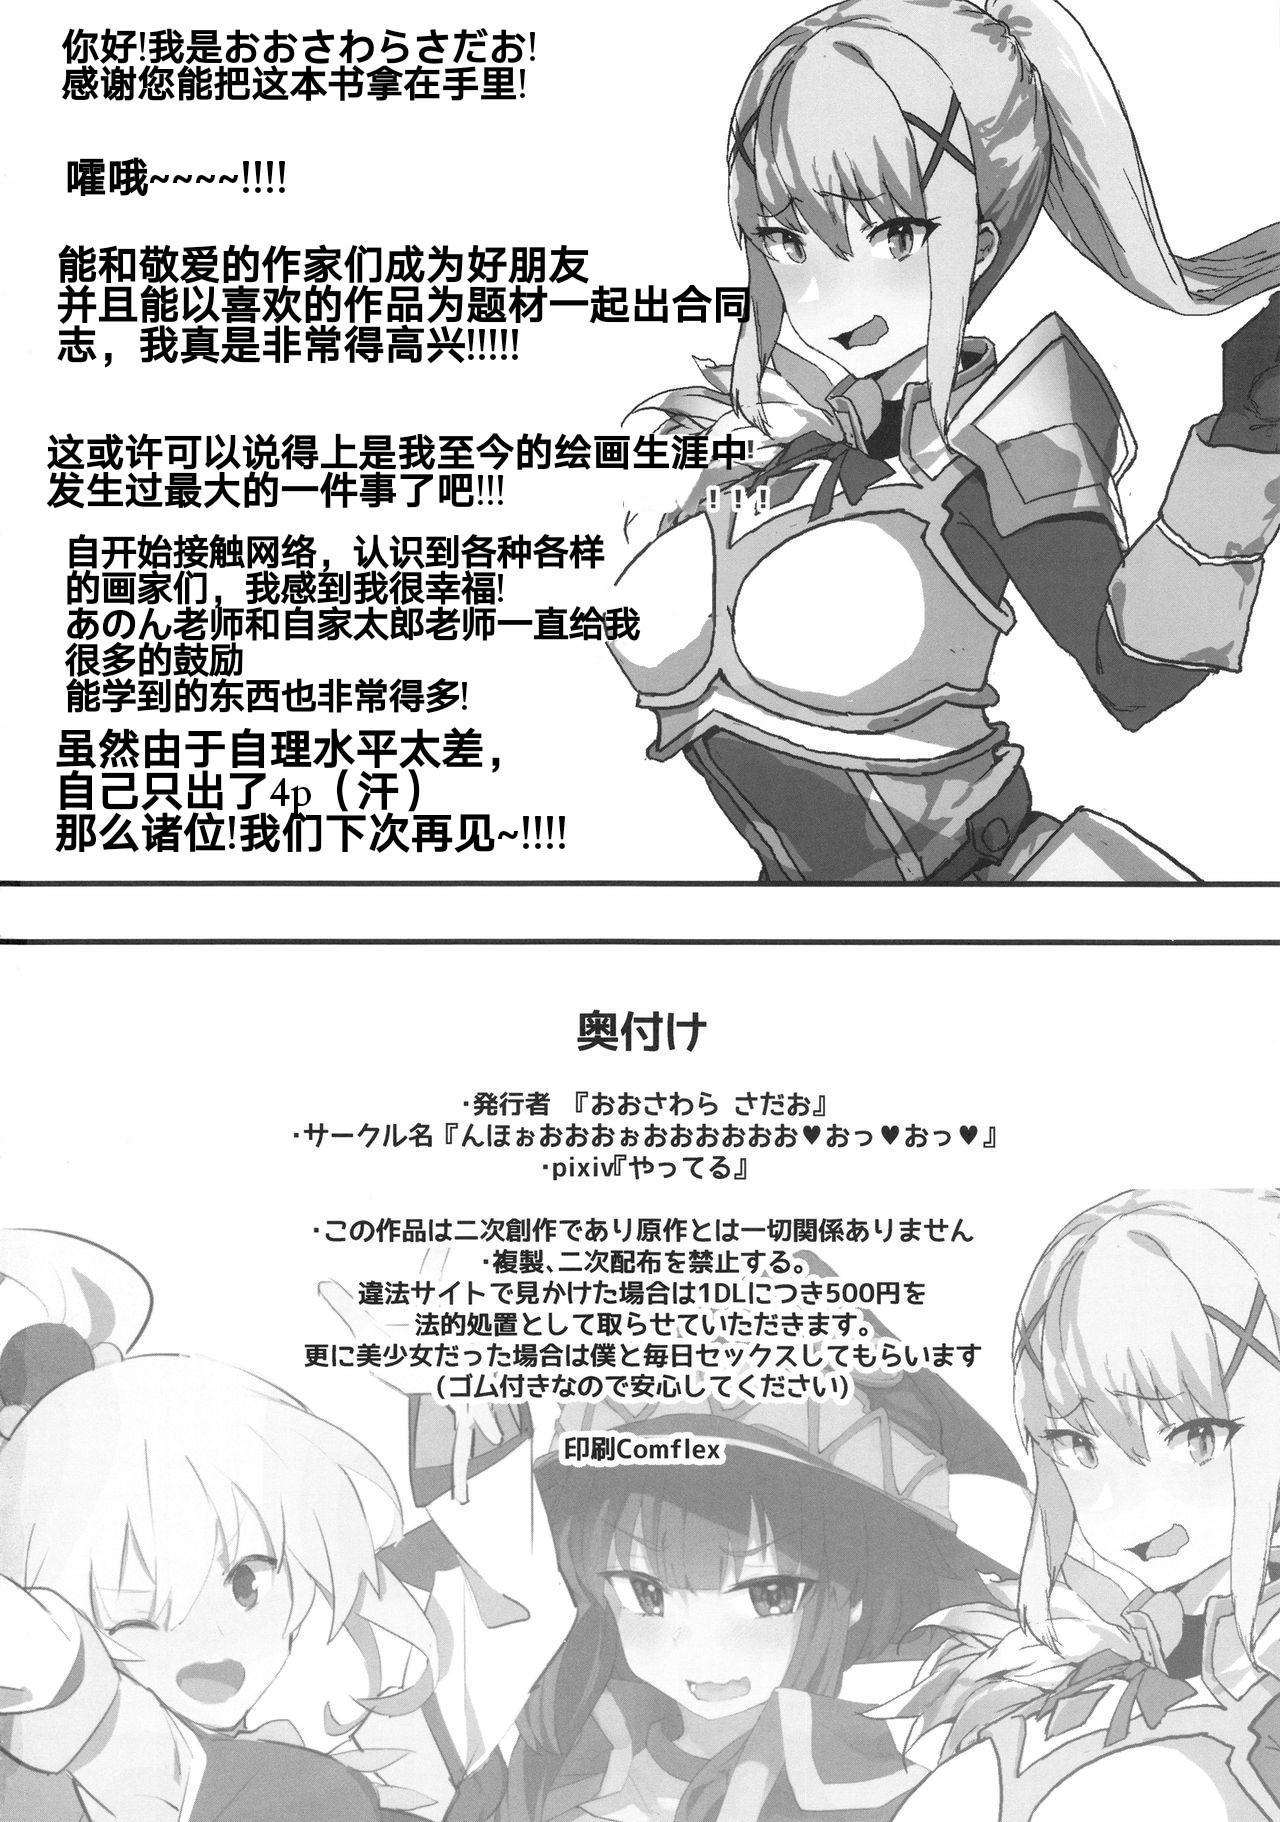 KonoSuba Goudoushi! 20